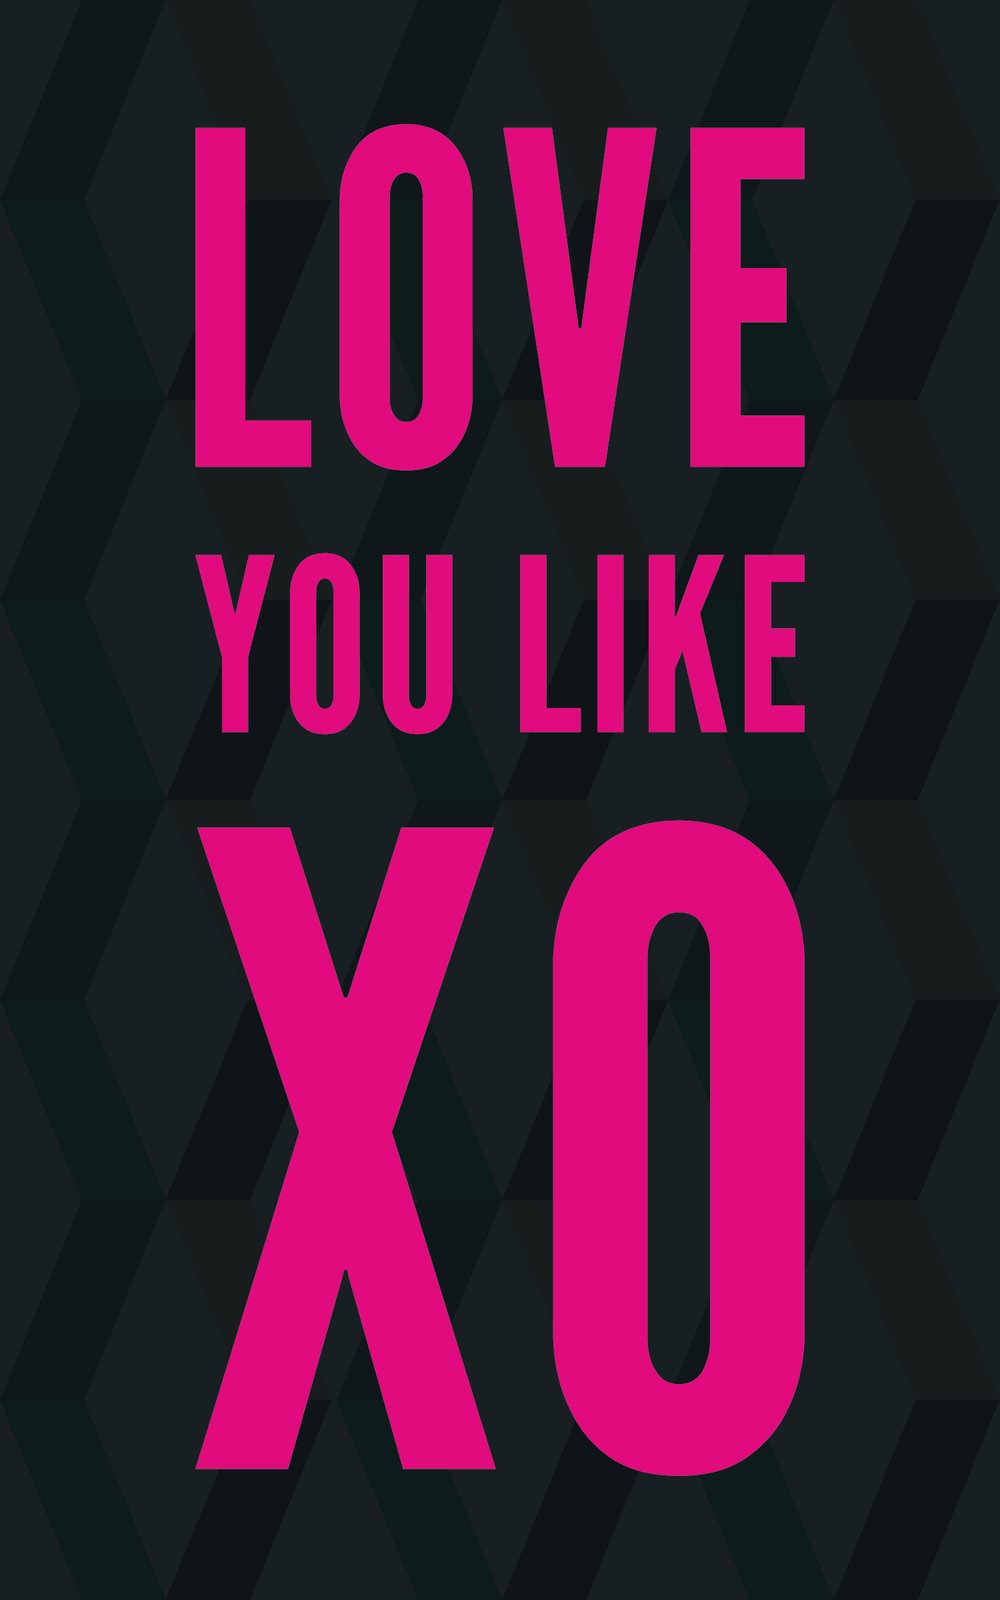 ValentinesDayBey2.jpg